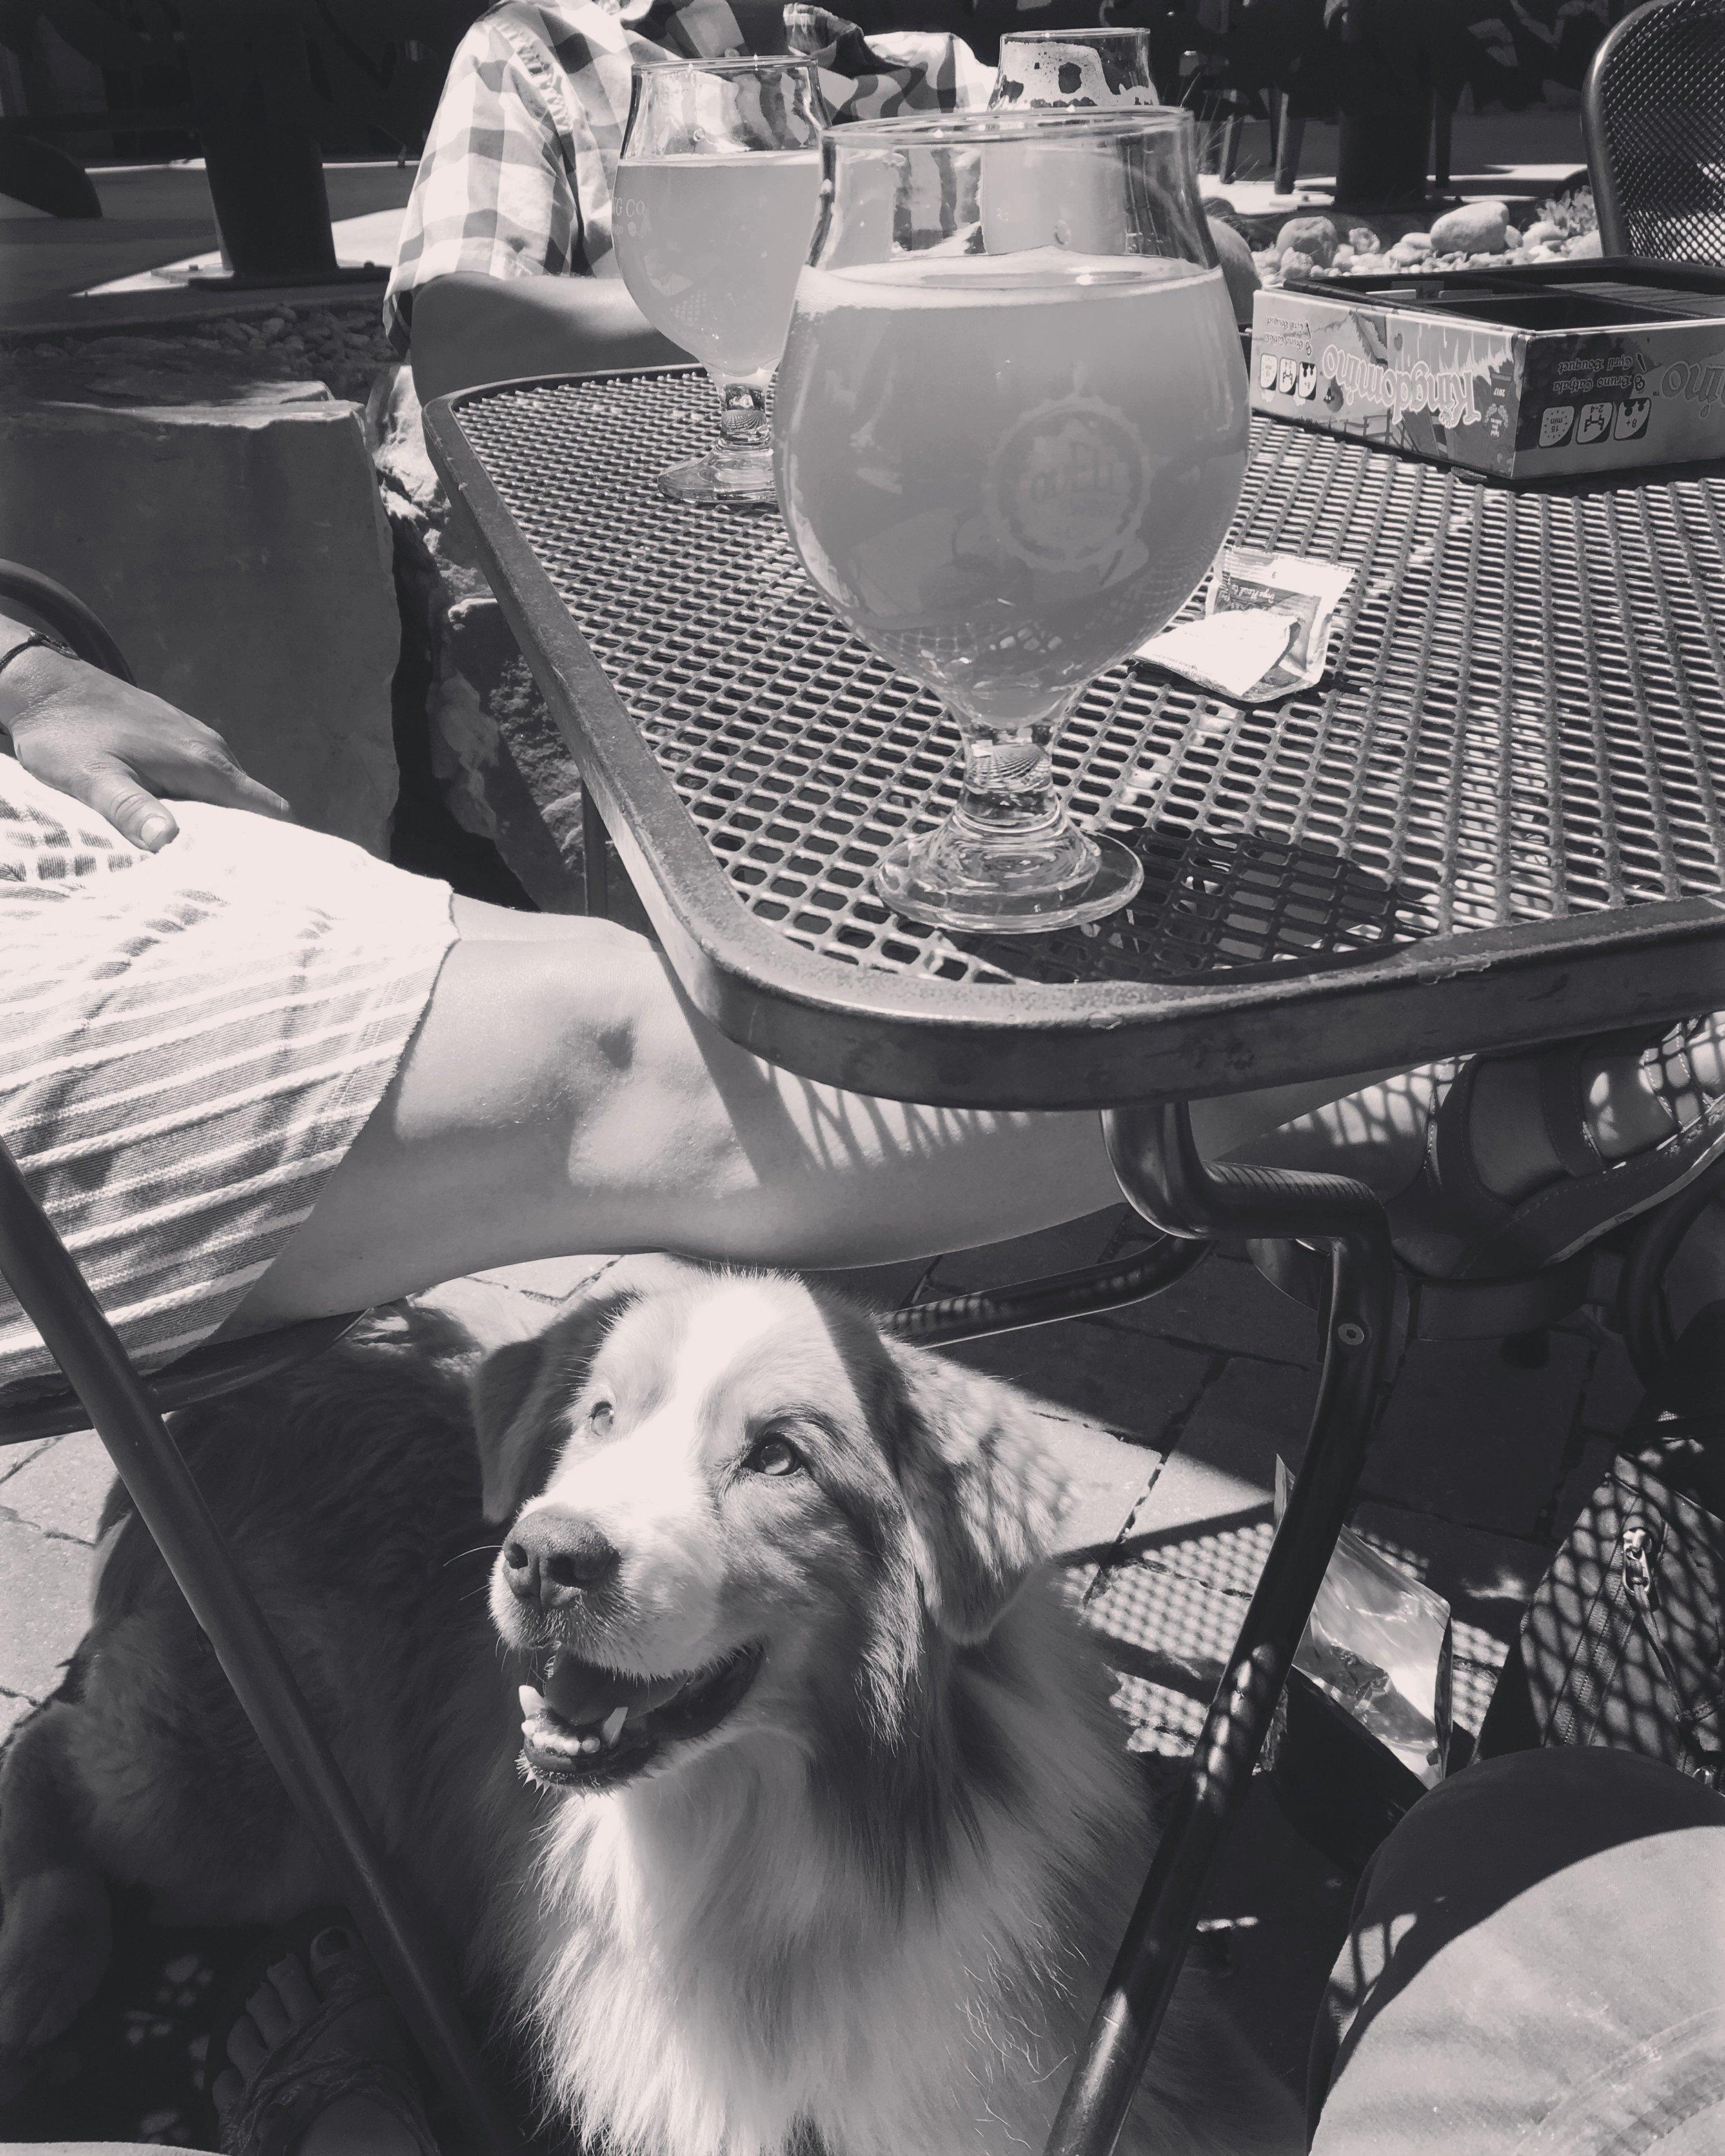 dogs-in-breweries-colorado